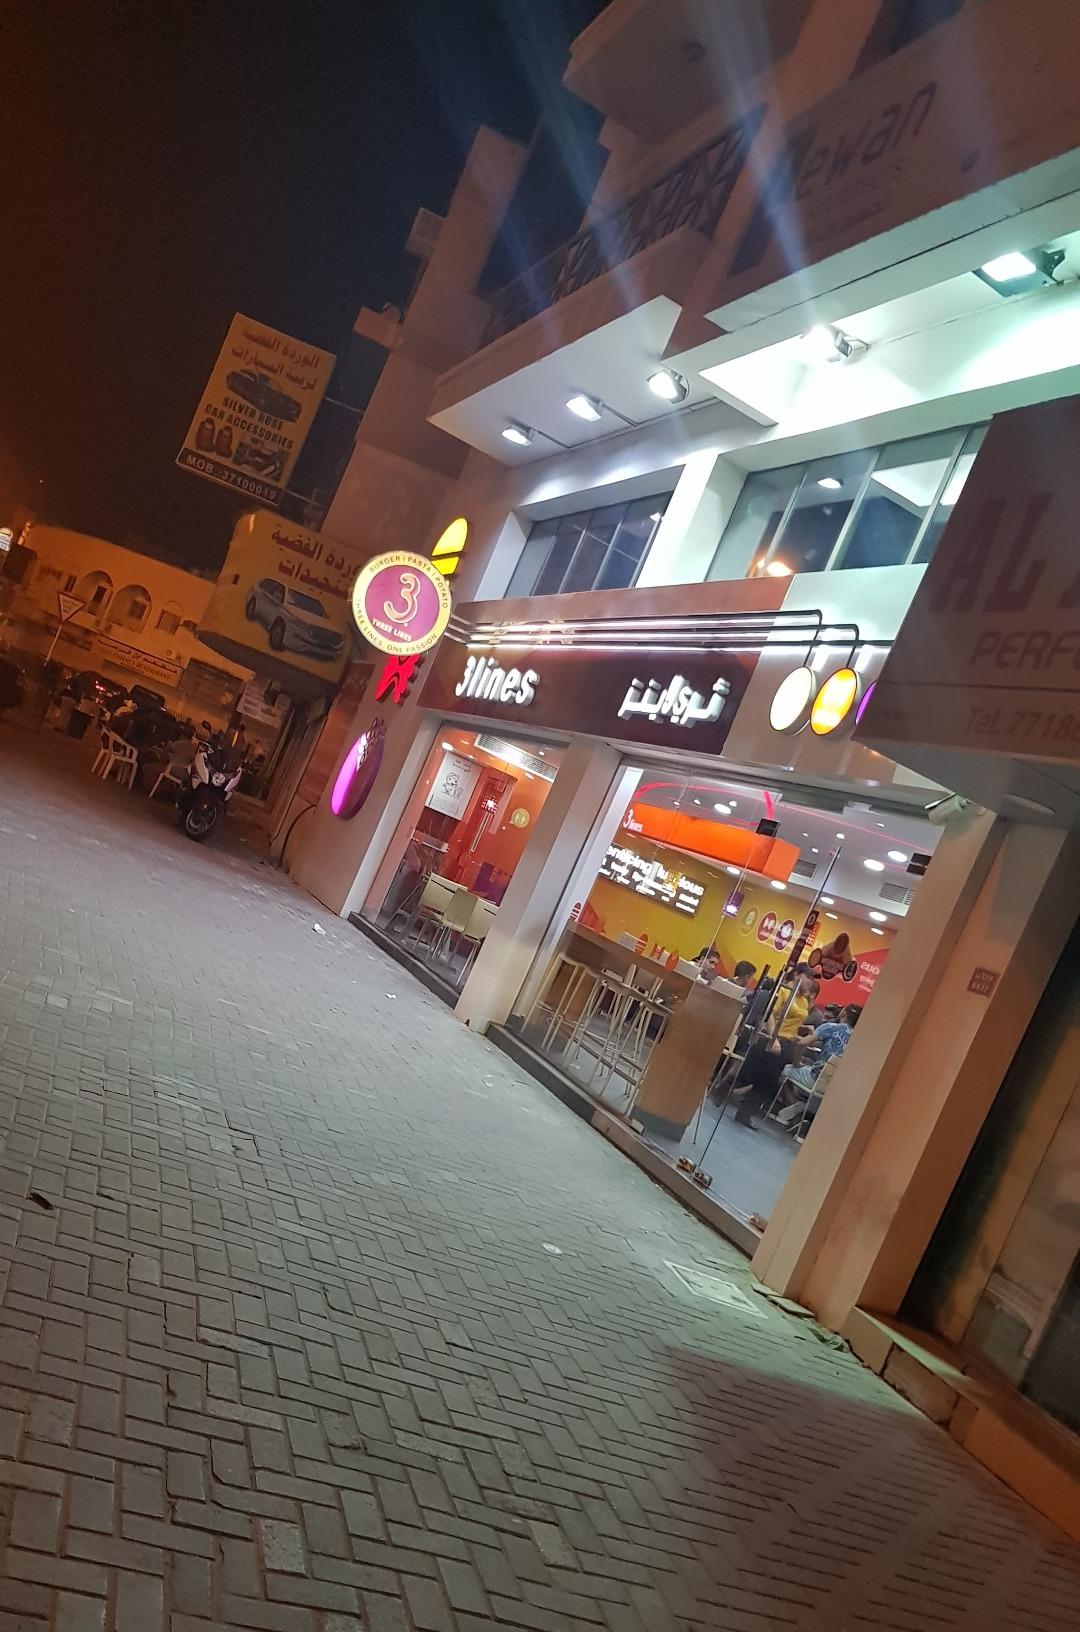 3 Lines - Bahrain